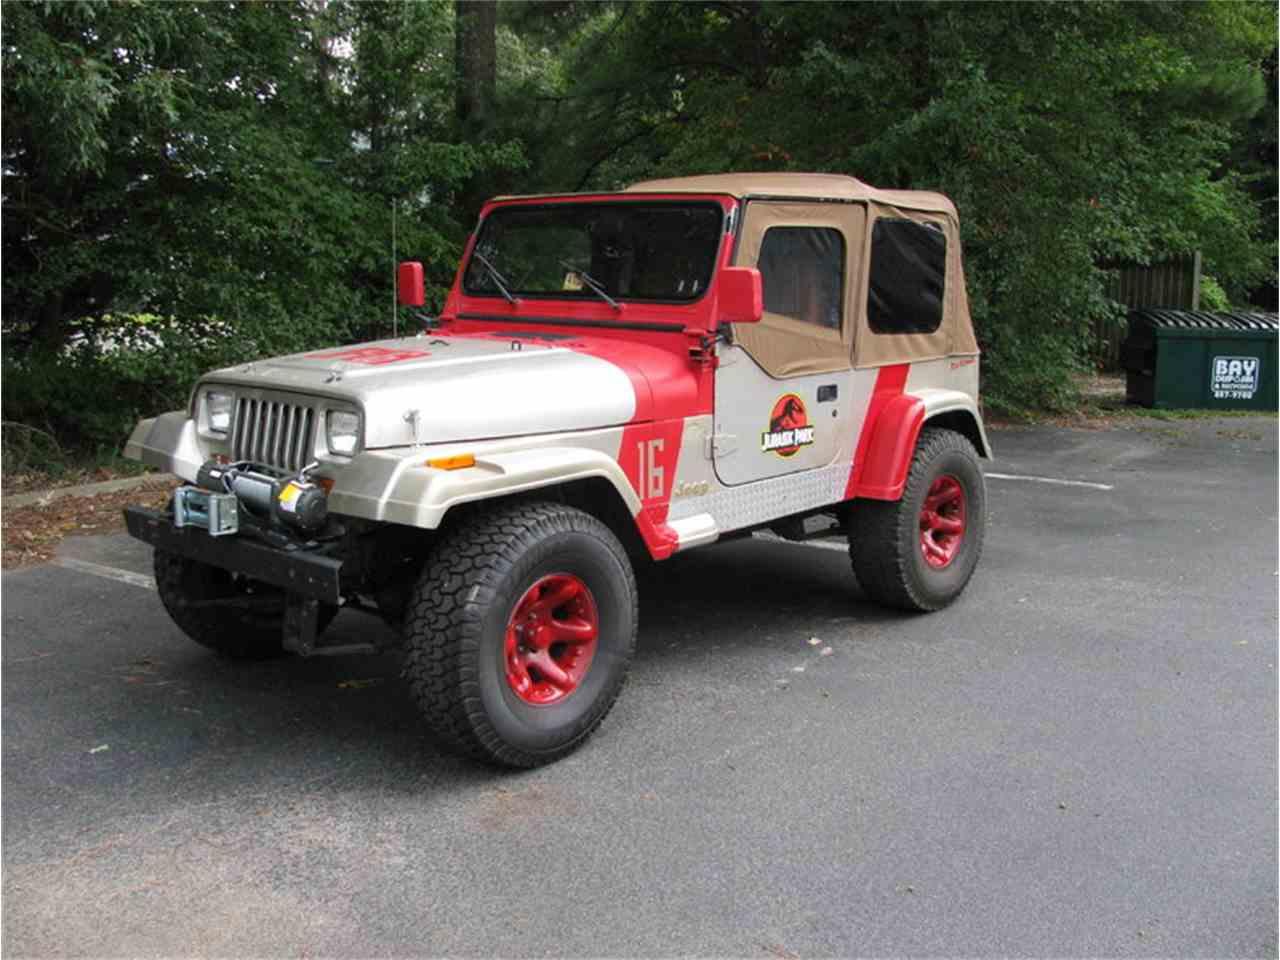 lydi listings north sale grande wrangler park view large in carolina for greensboro classiccars c std jeep jurassic of rio picture